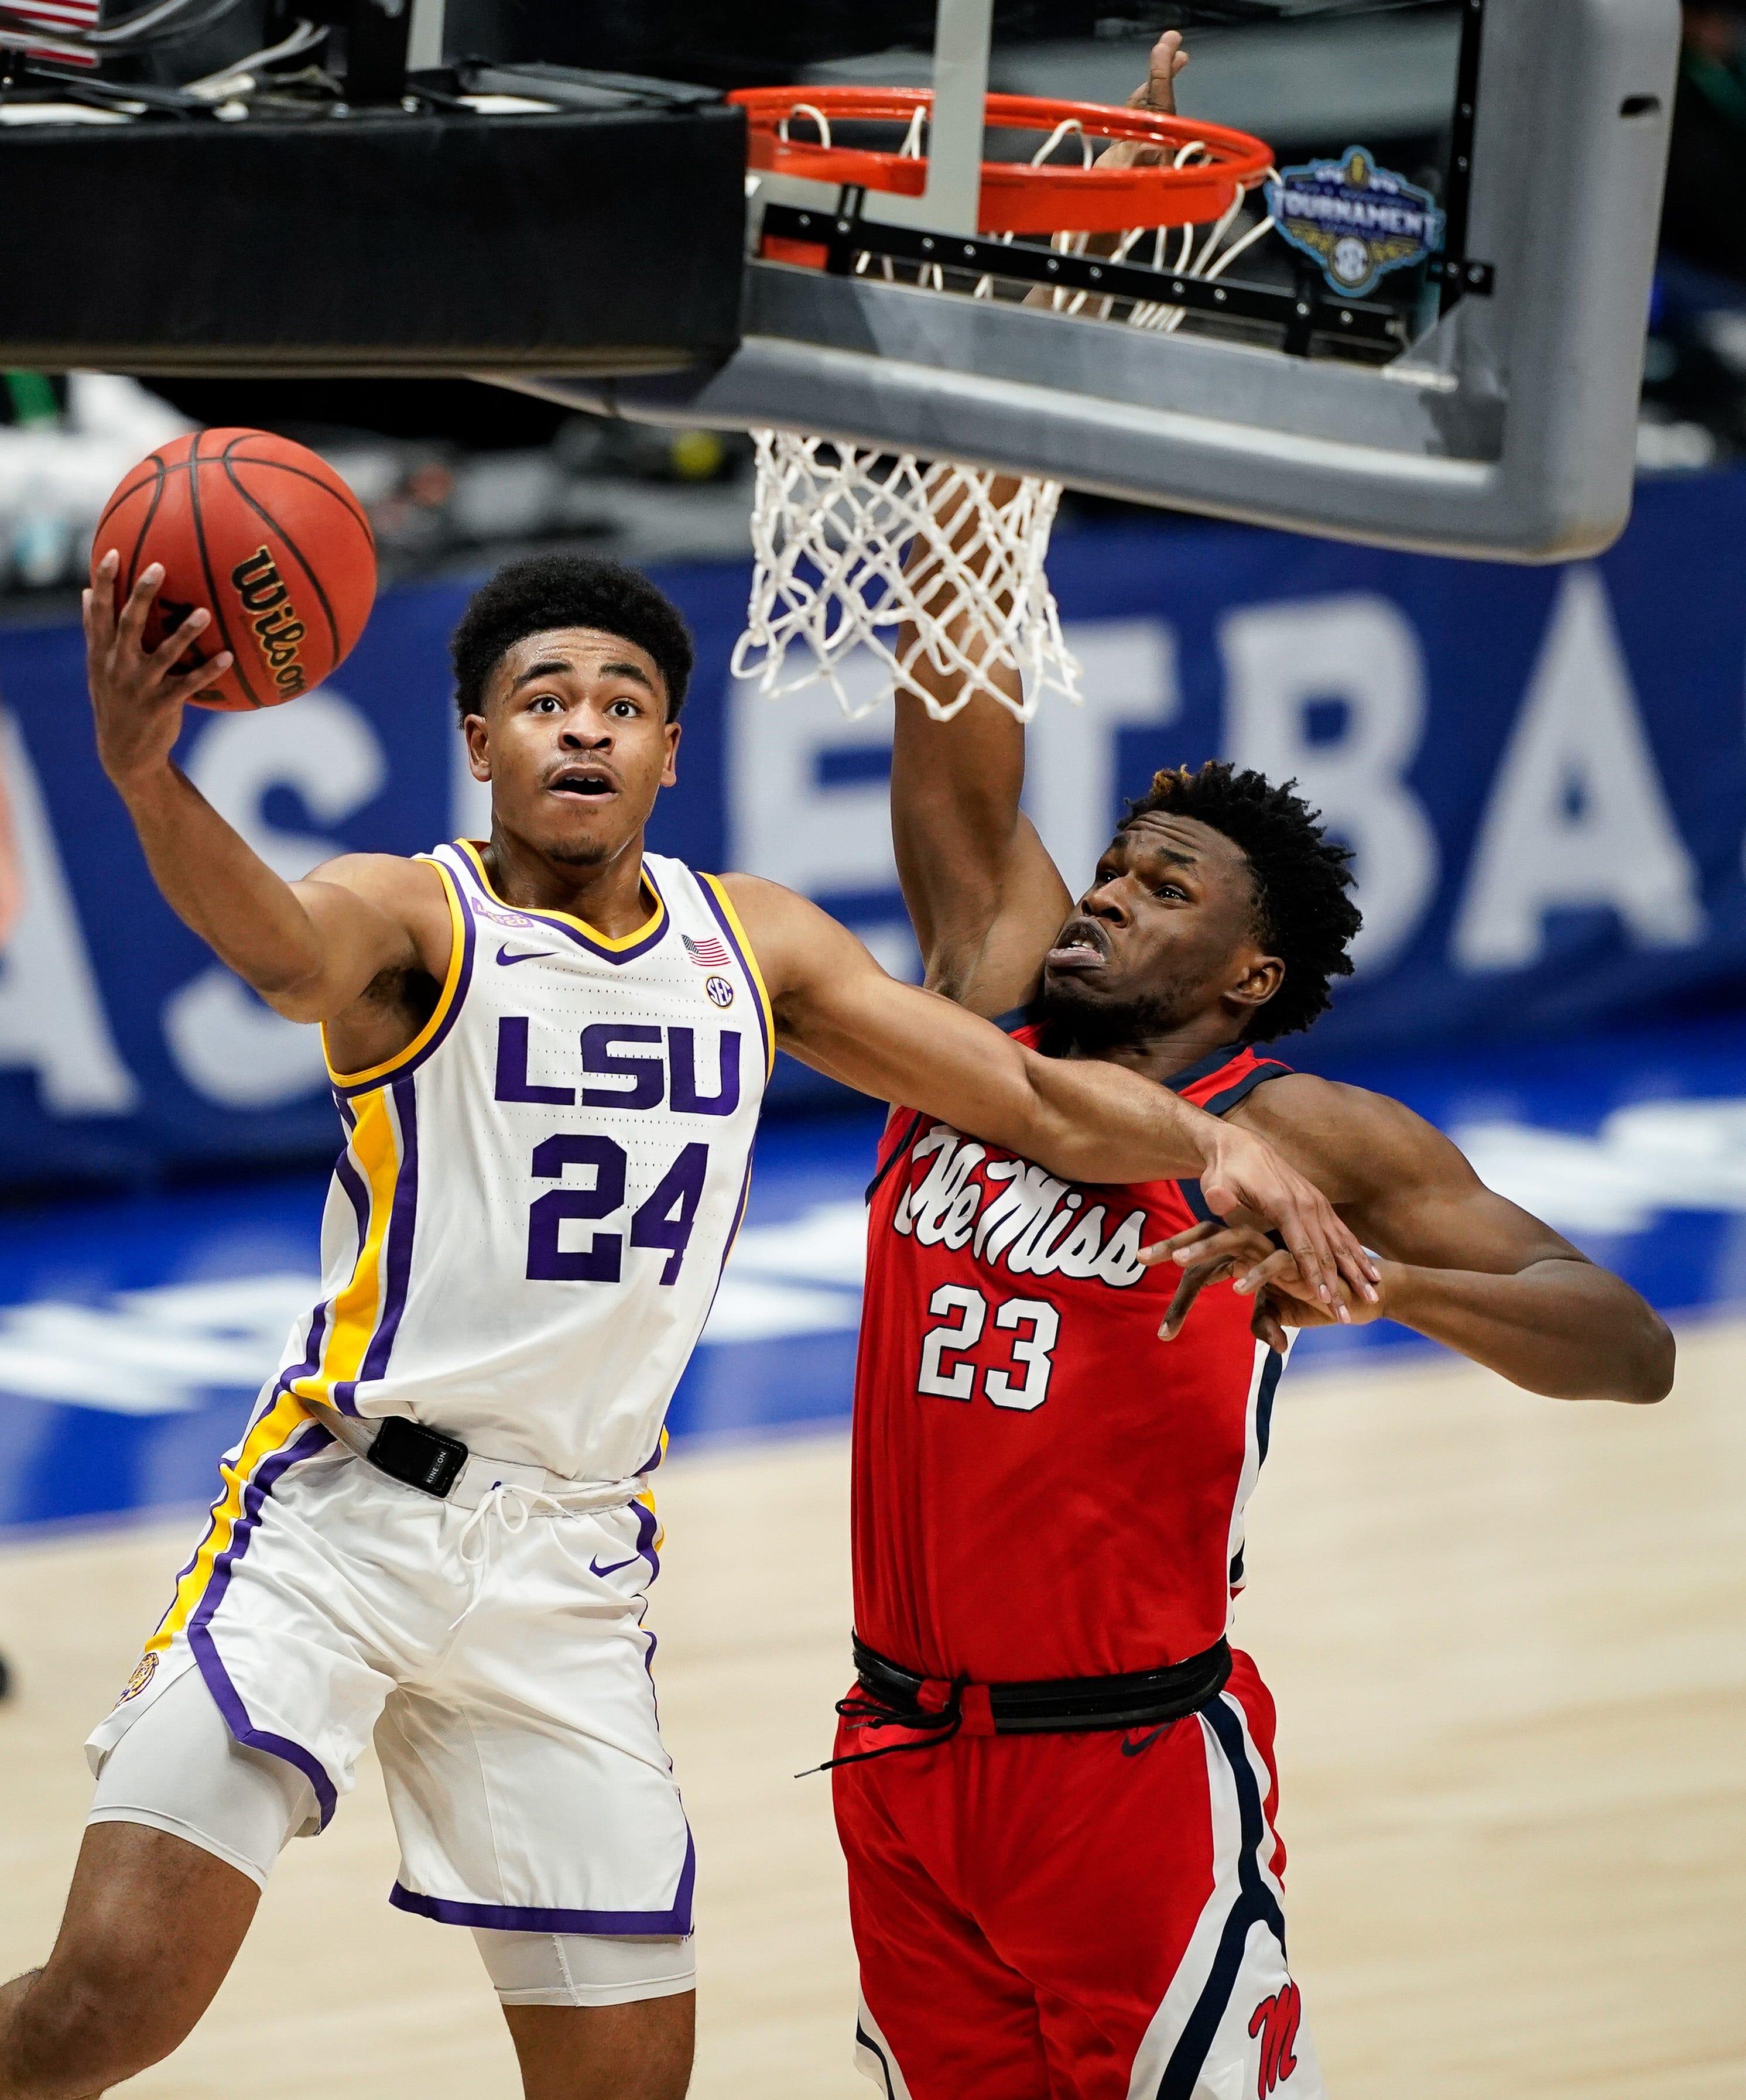 LSU basketball loses fourth player to NBA Draft - Cameron Thomas